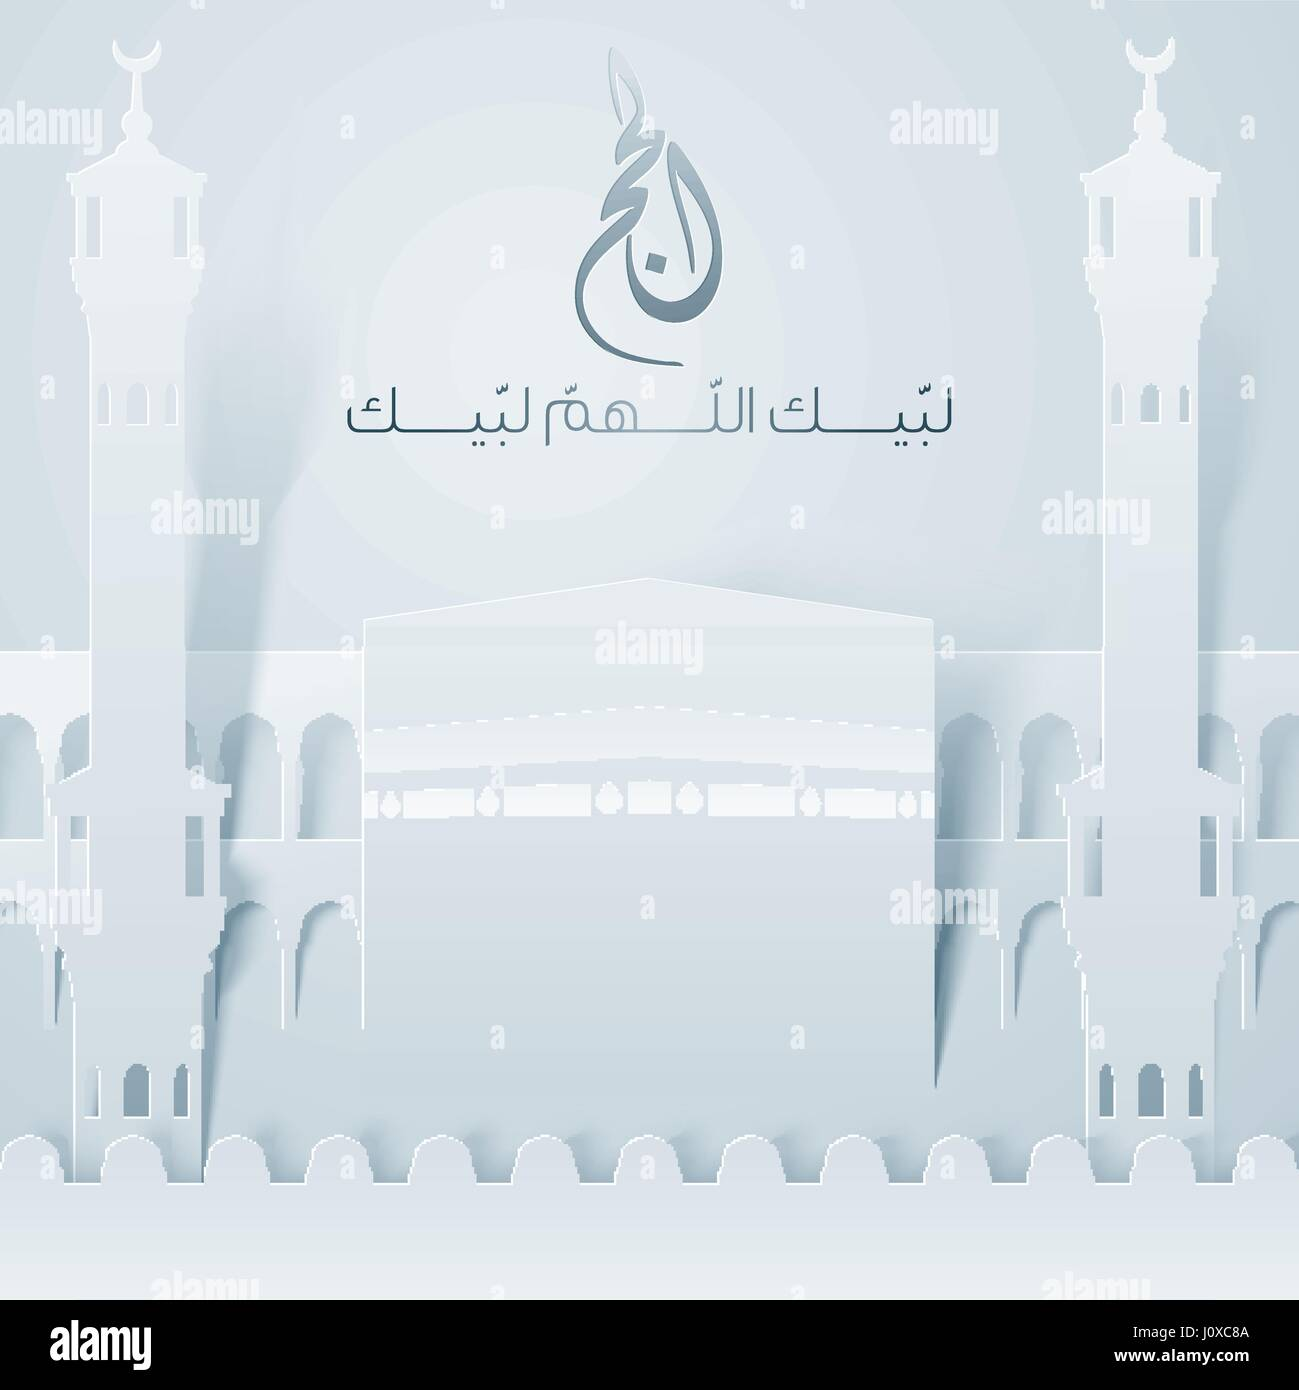 Kaaba and mosque islamic hajj eid mubarak stock vector art kaaba and mosque islamic hajj eid mubarak m4hsunfo